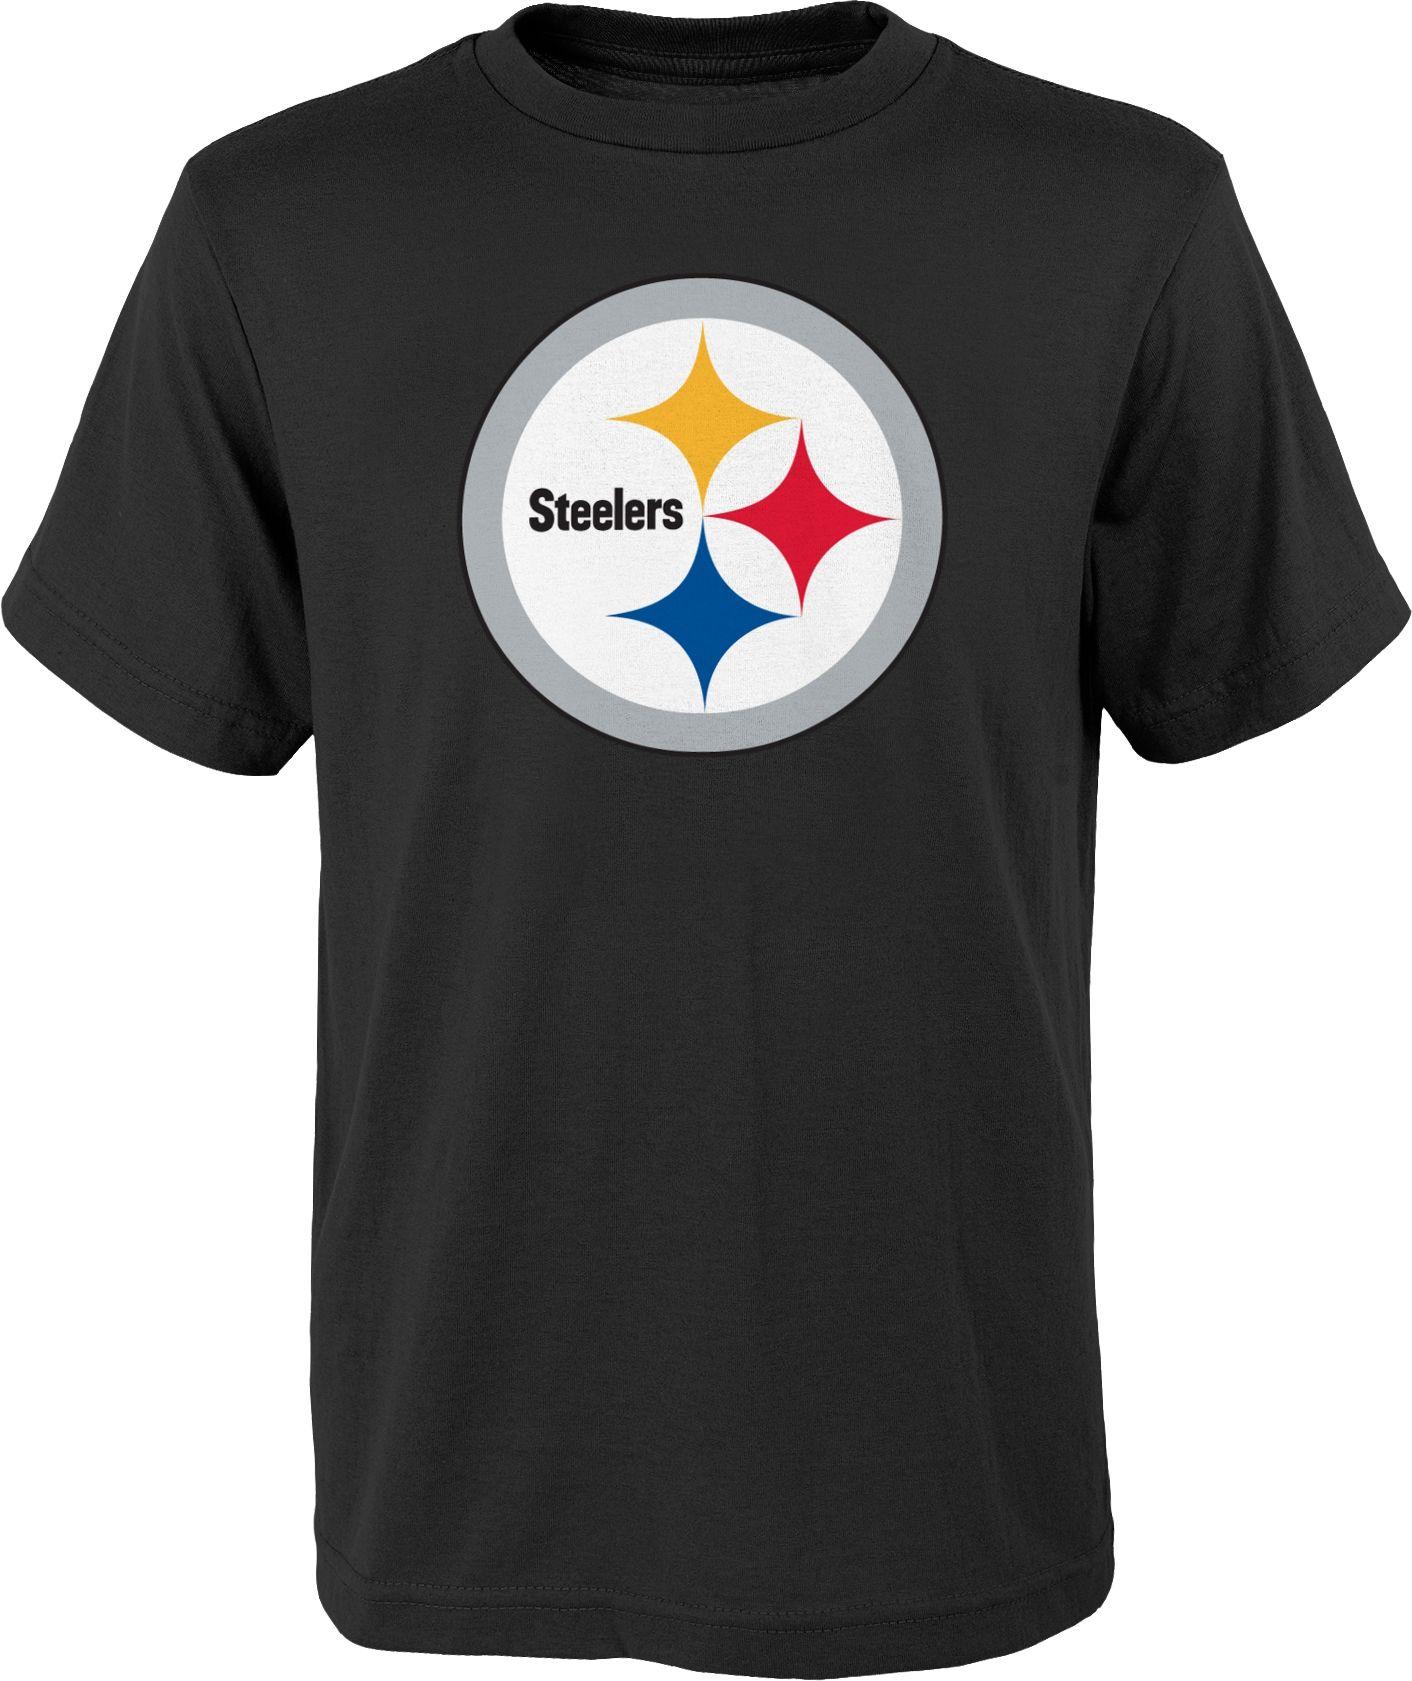 Nfl Team Apparel Youth Pittsburgh Steelers Logo Black T Shirt